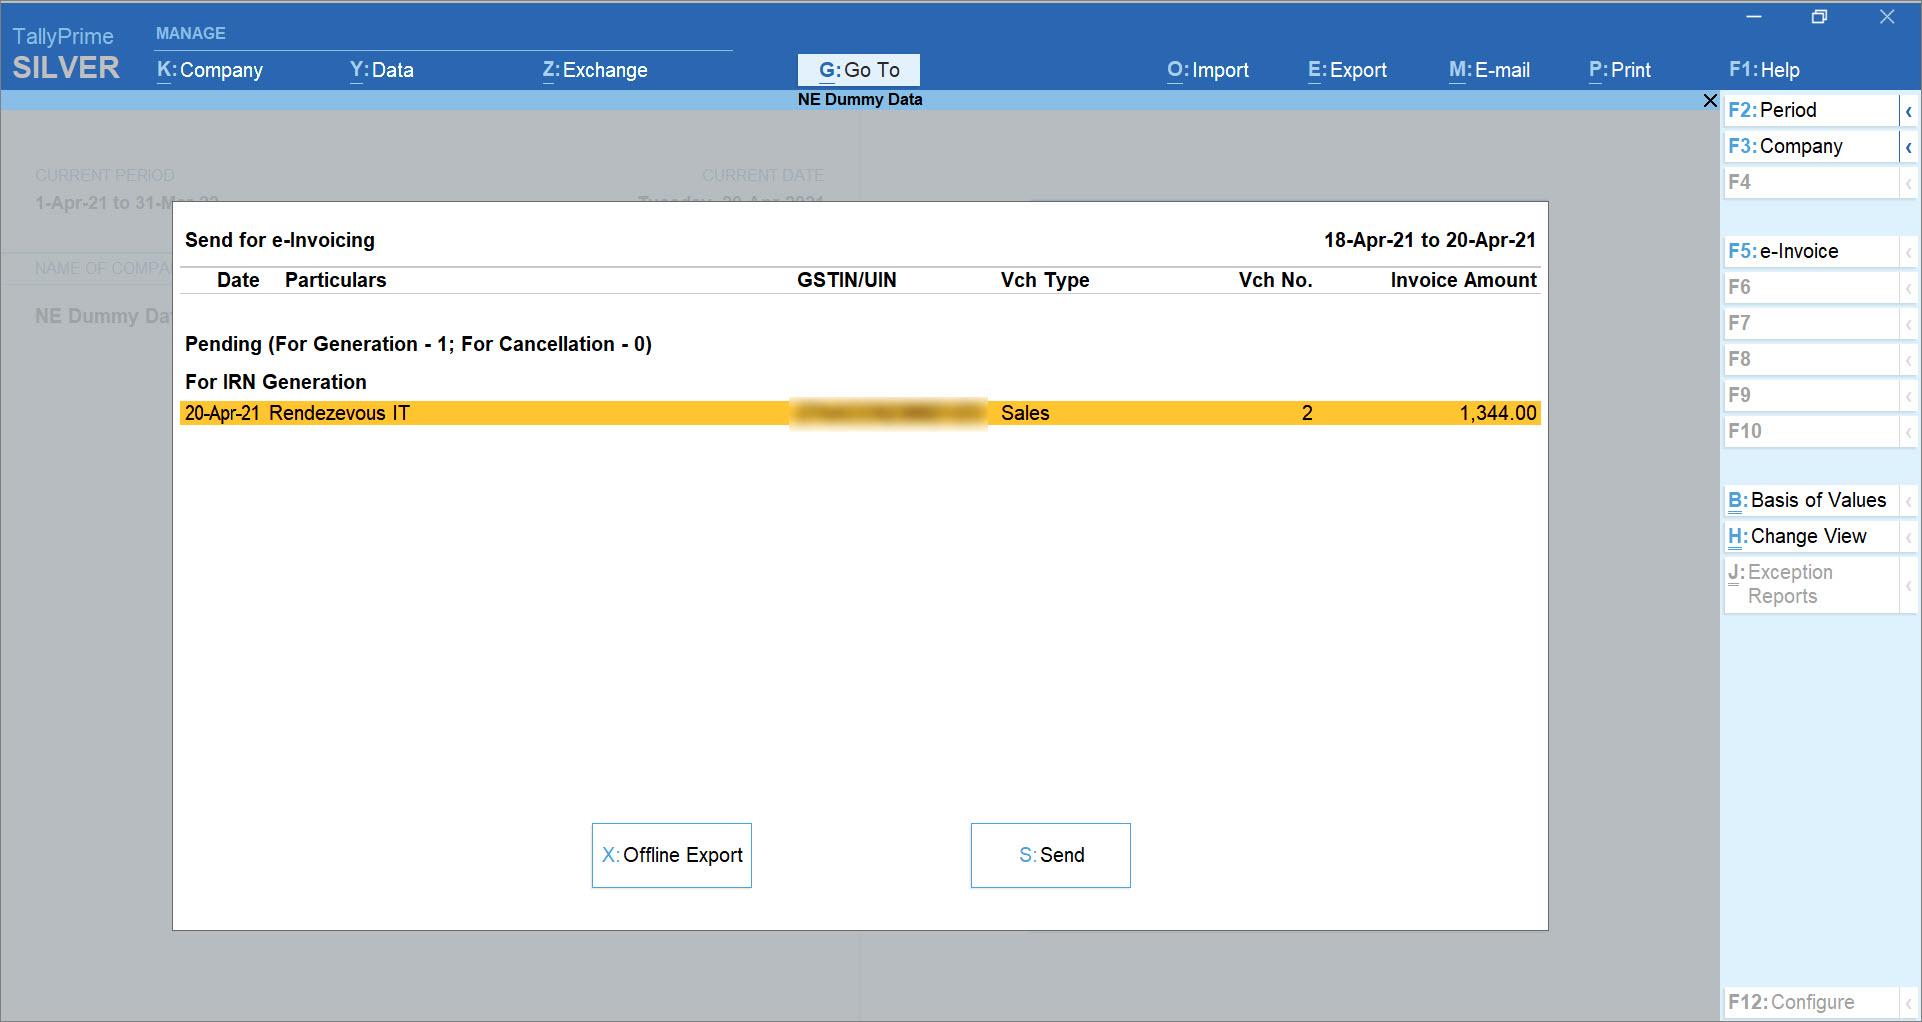 Send for e-Invoicing screen in TallyPrime